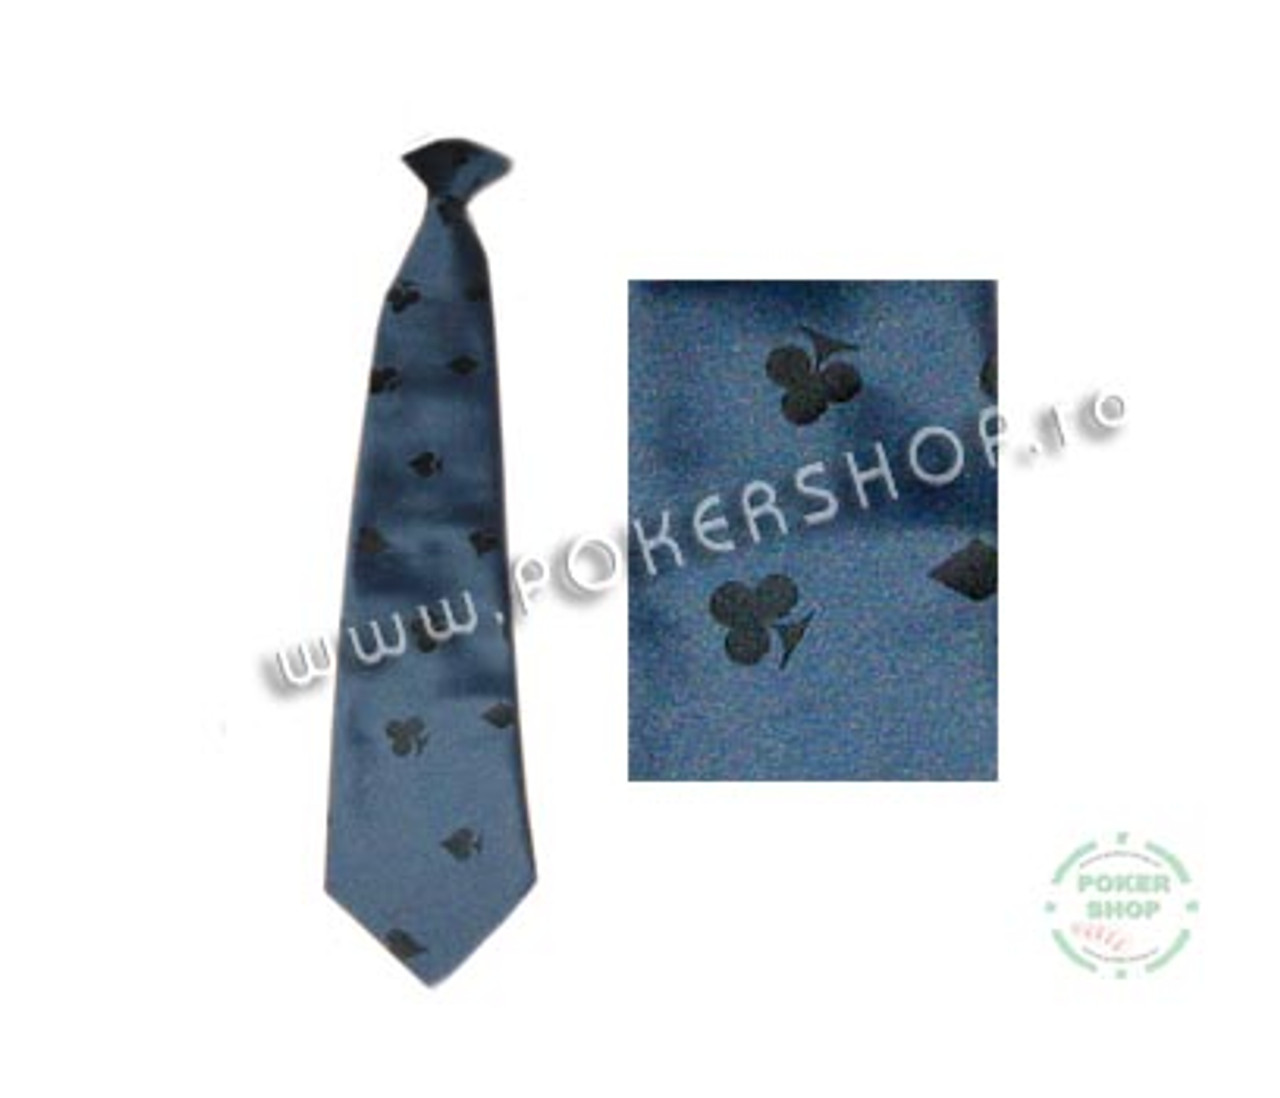 Cravata Playing Cards Symbol